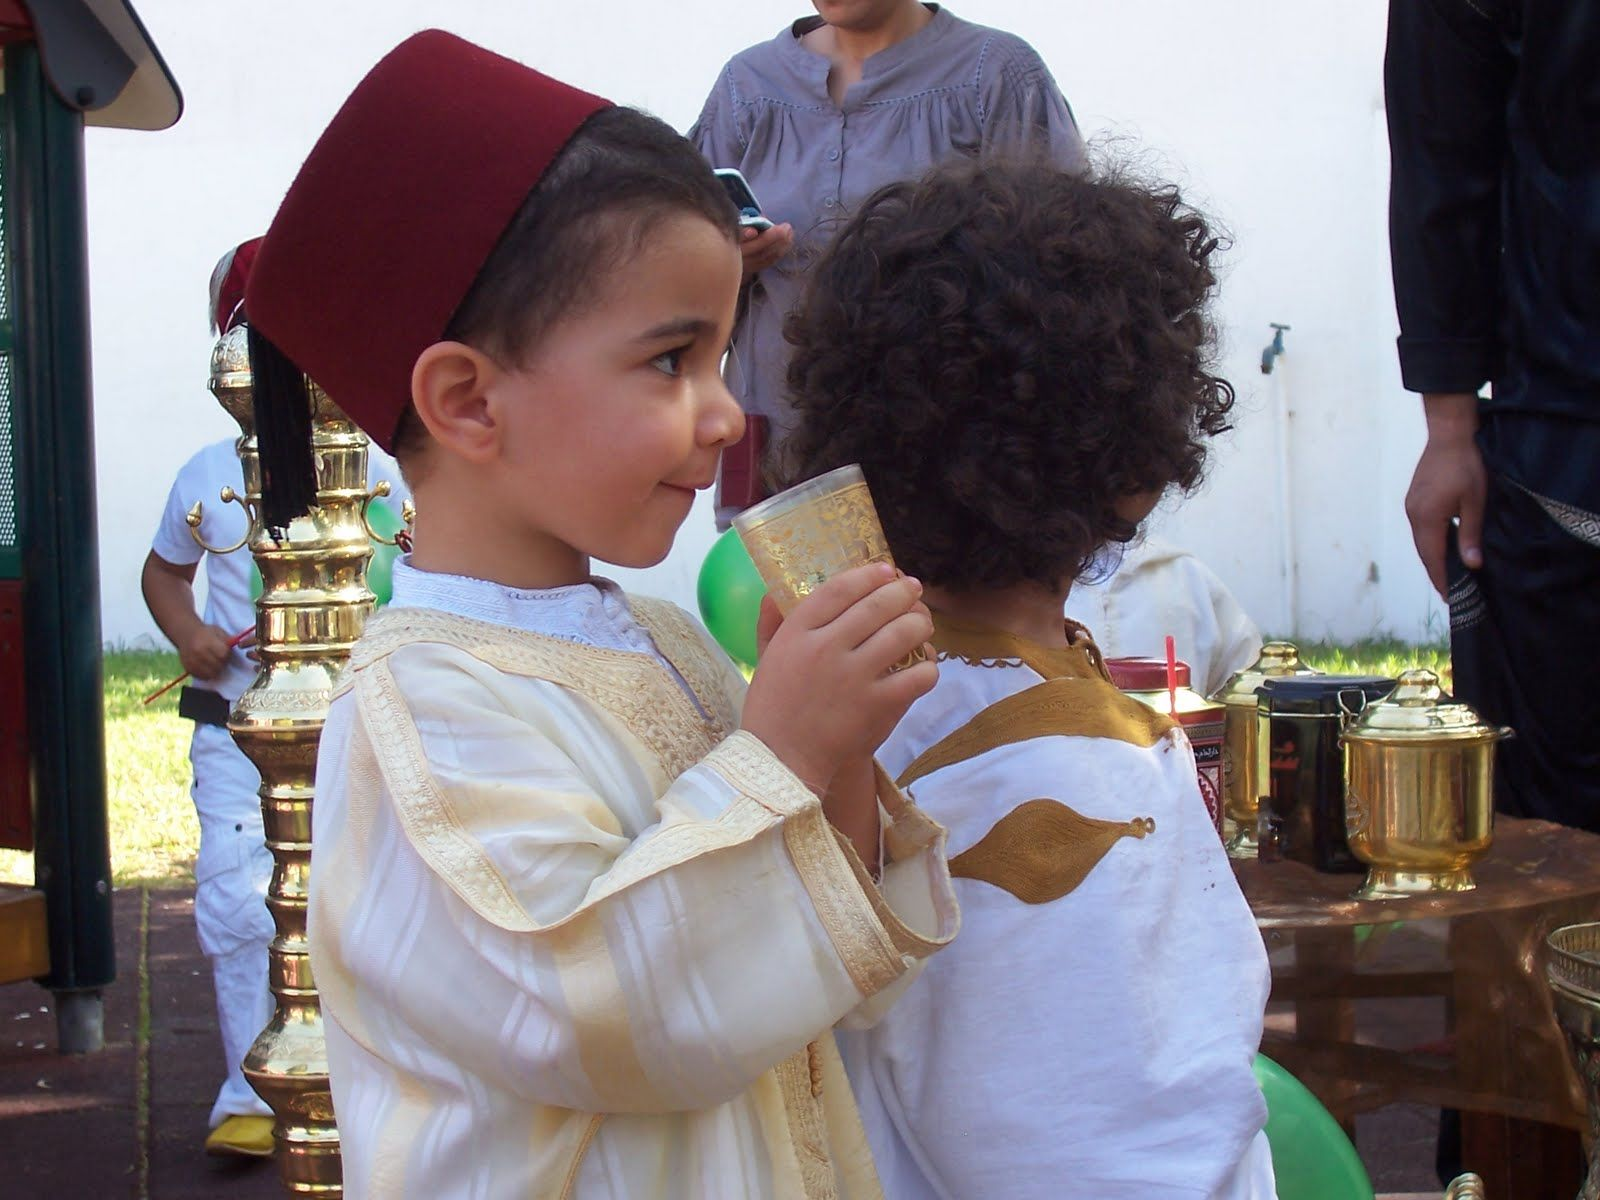 Moroccan djellaba and fez hat for little boy Baby Boy Fashion 2a878e33e21